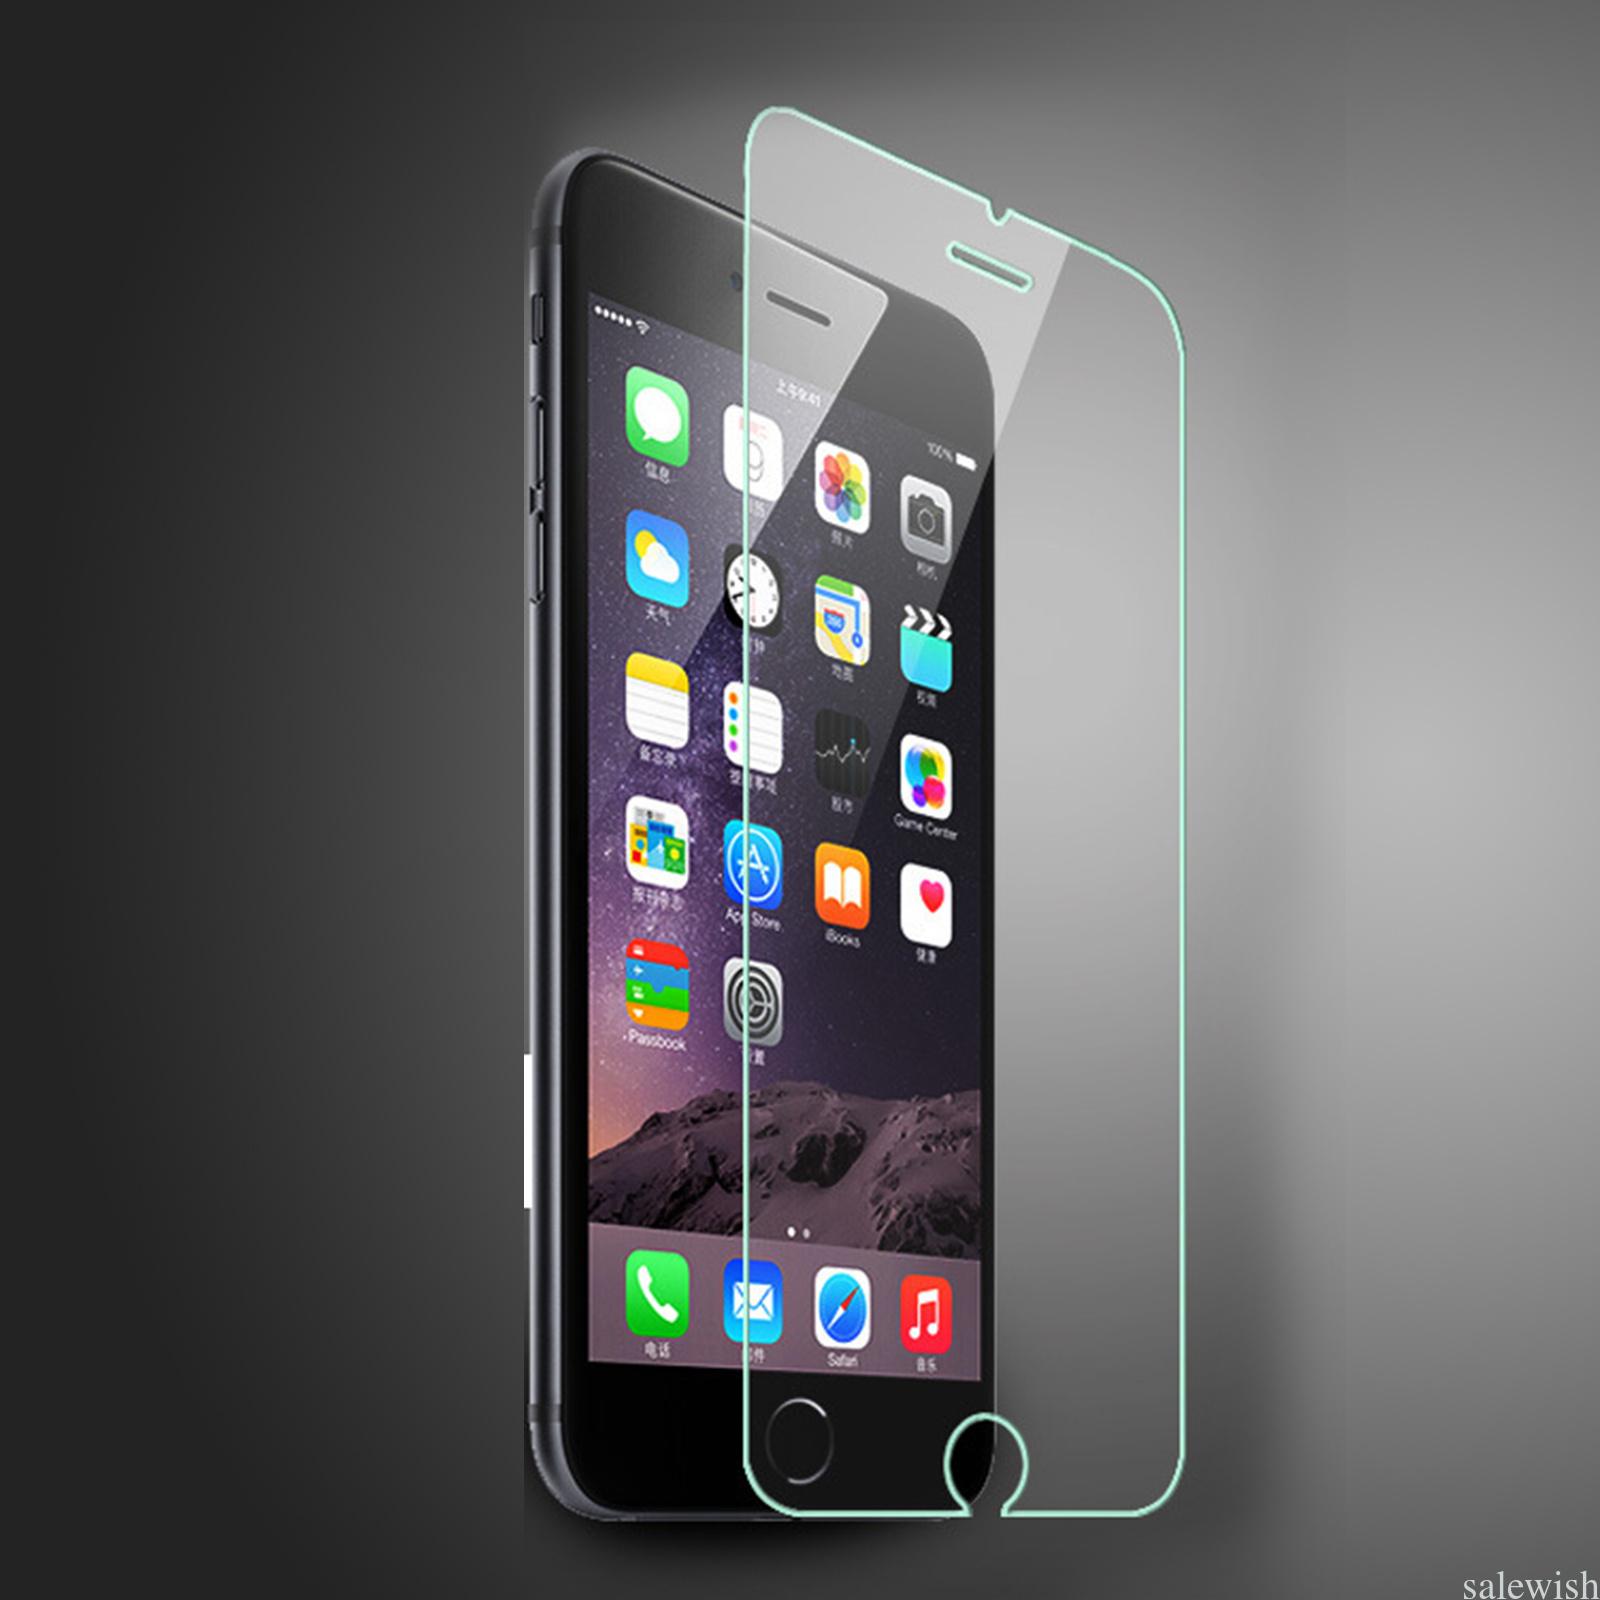 Protector-Cristal-Templado-Silk-para-iPhone-6-6S-7-Plus-9H-Transparente-New miniatura 12